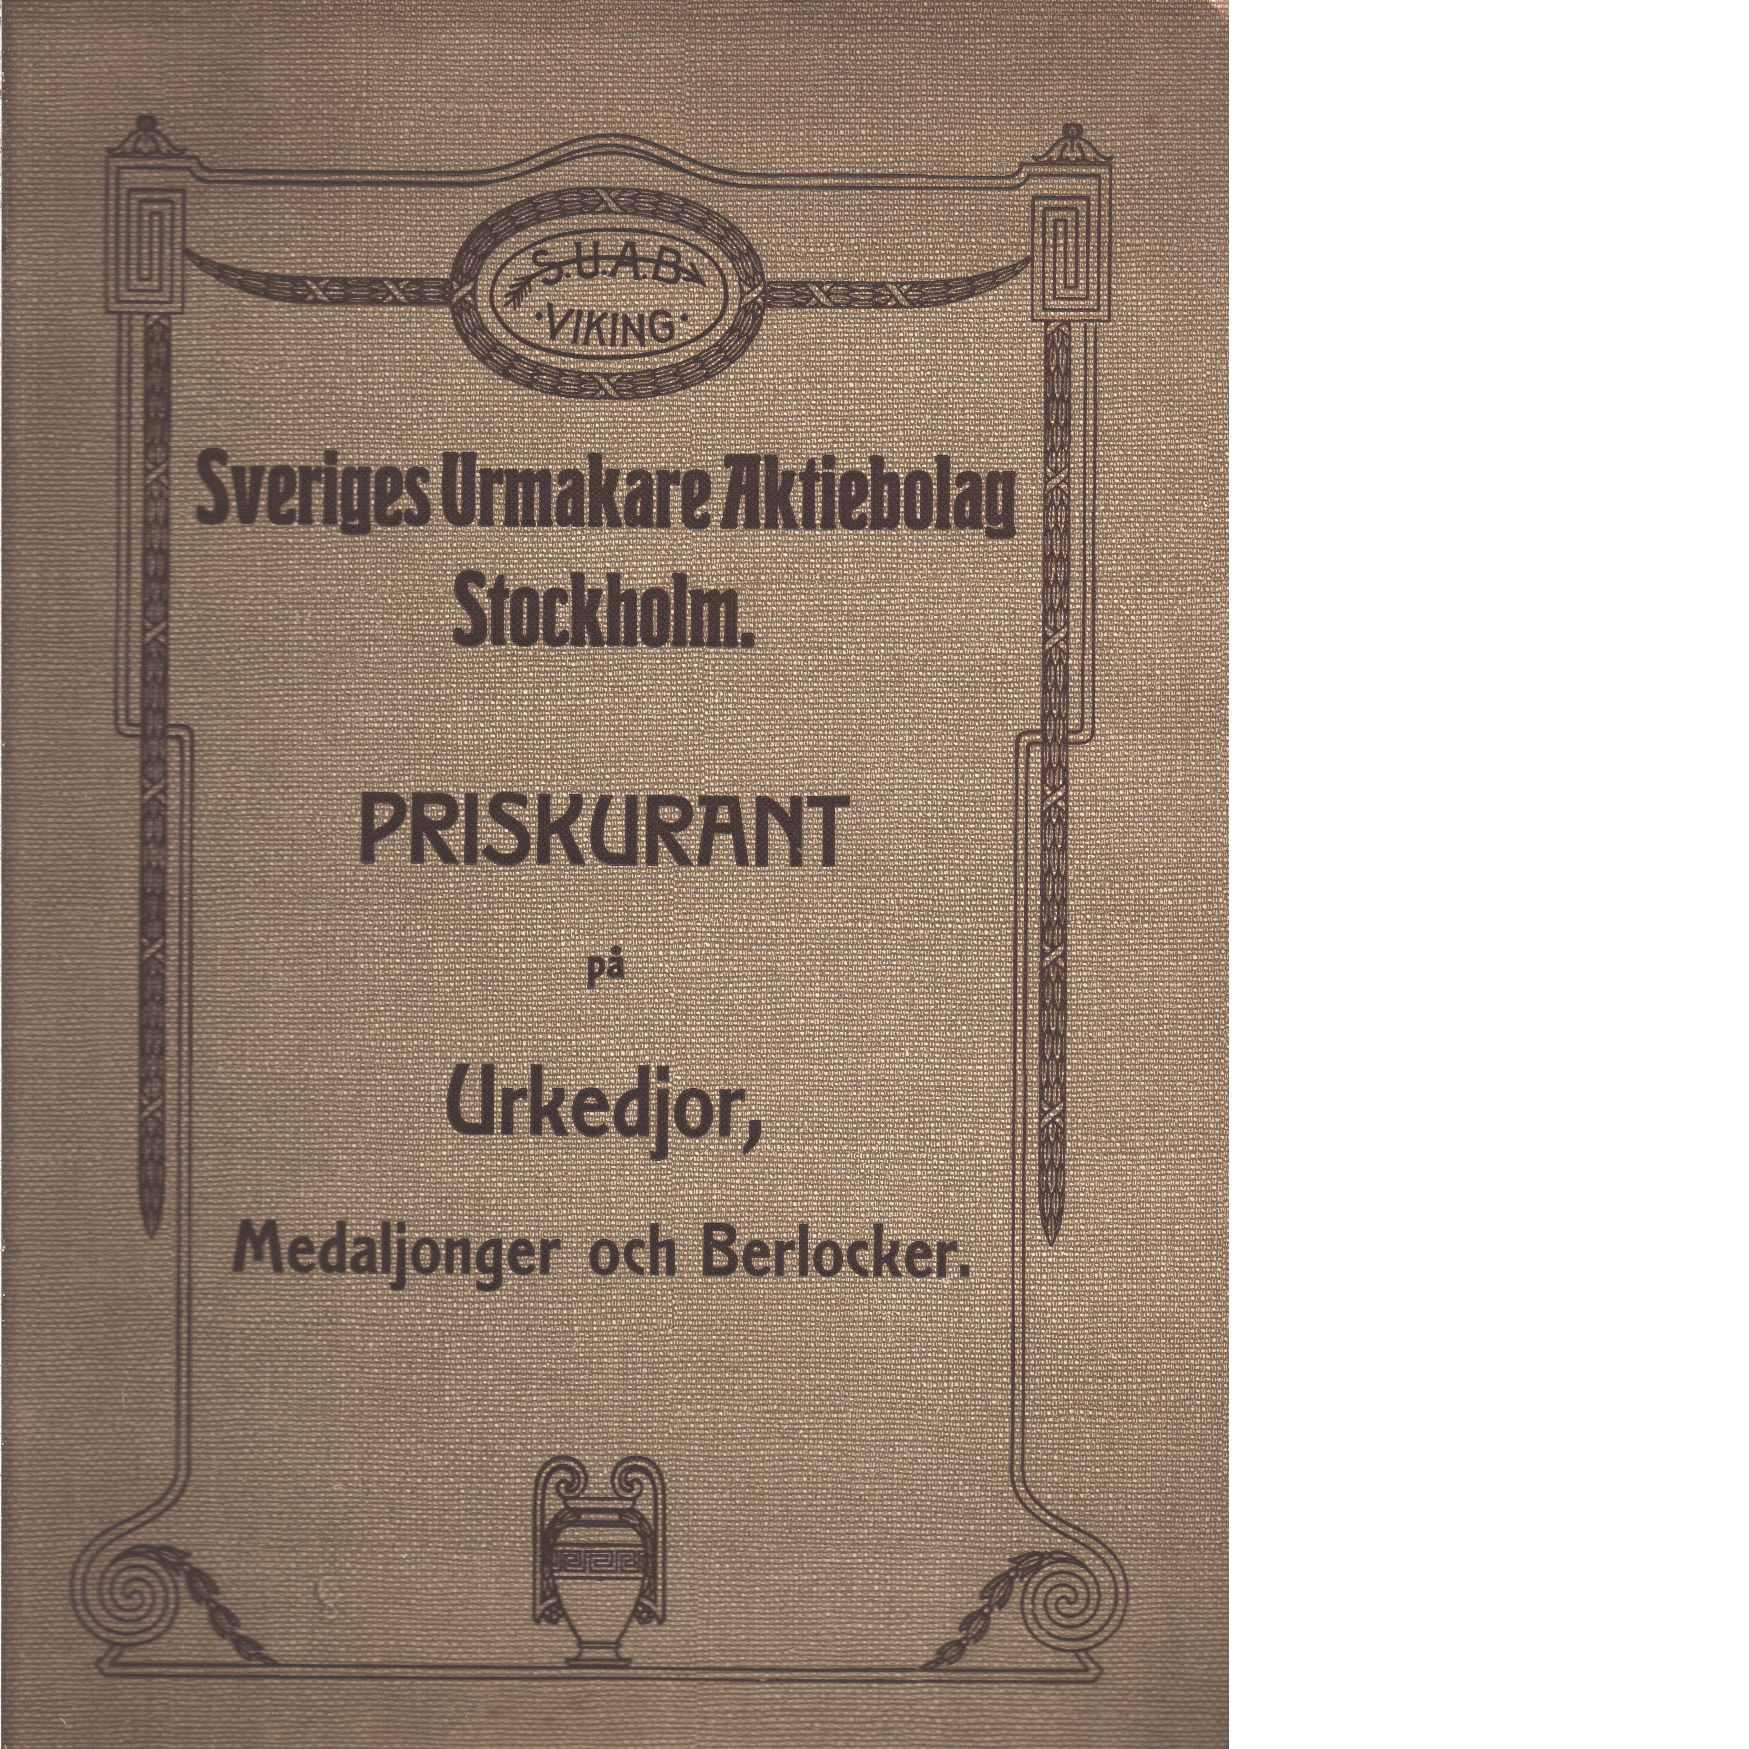 Priskurant på urkedjor, medaljonger och berlocker - Sveriges urmakare aktiebolag Stockholm